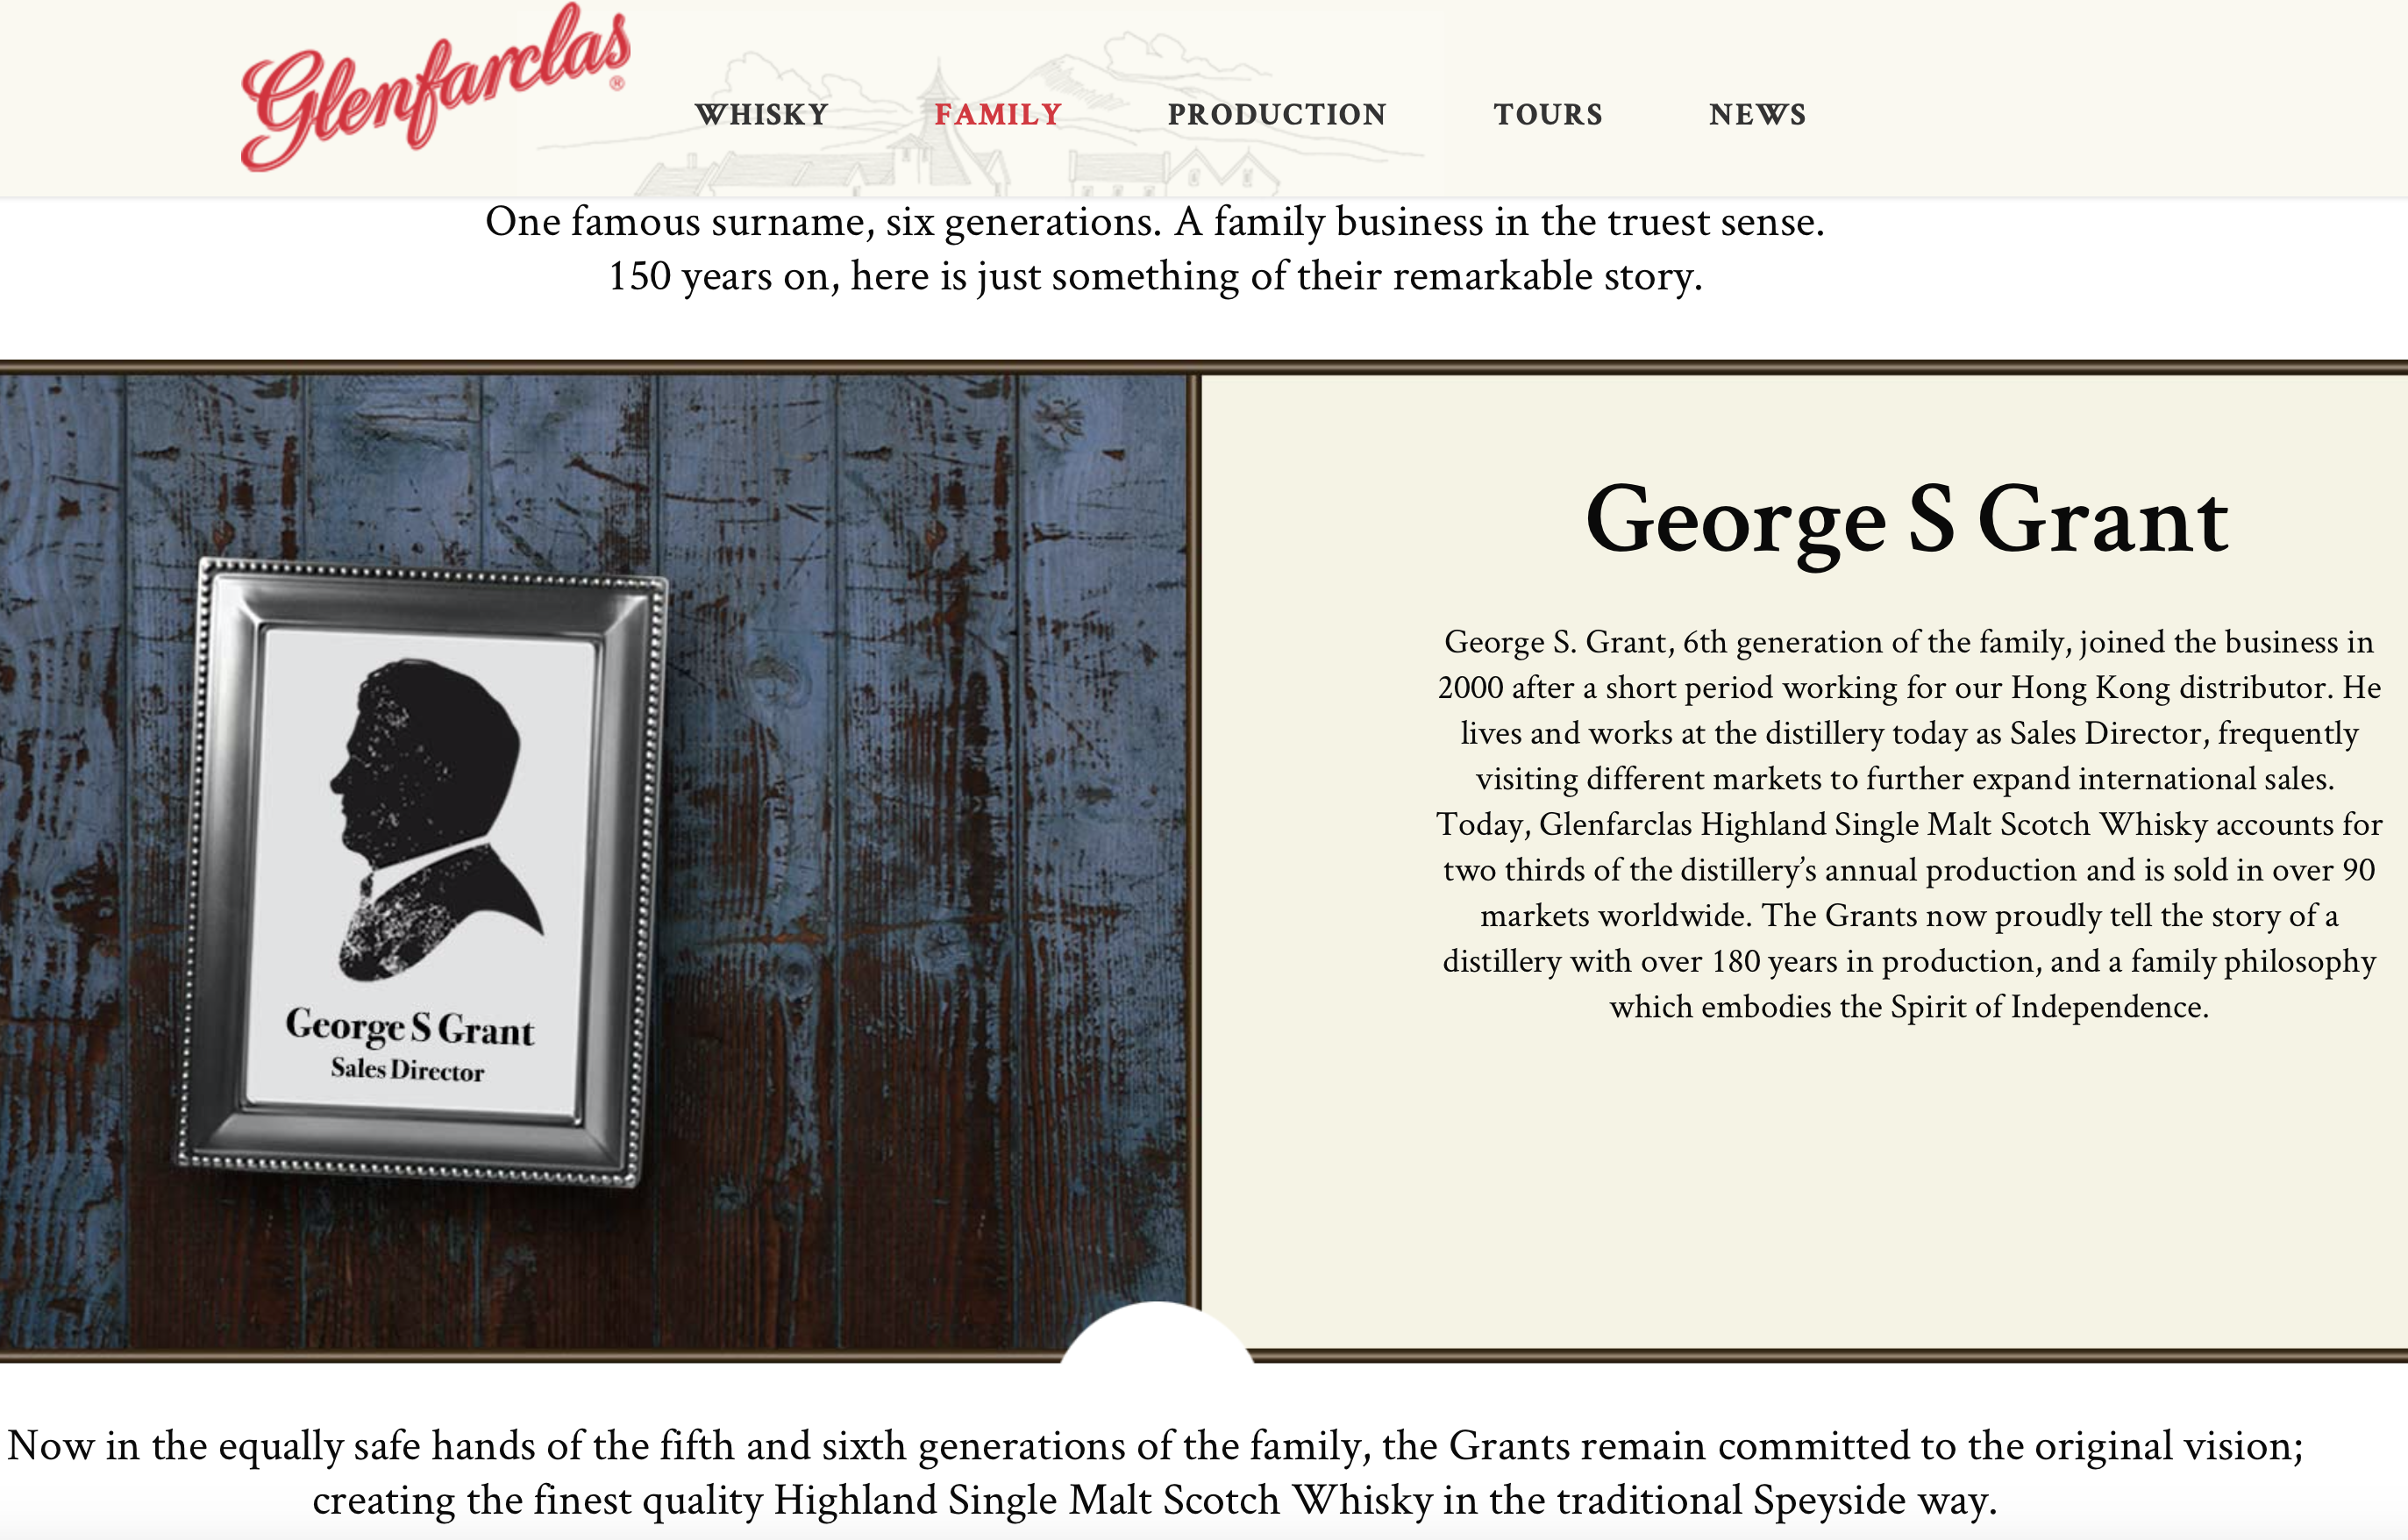 George S. Grant 6th Generation Glenfarclas